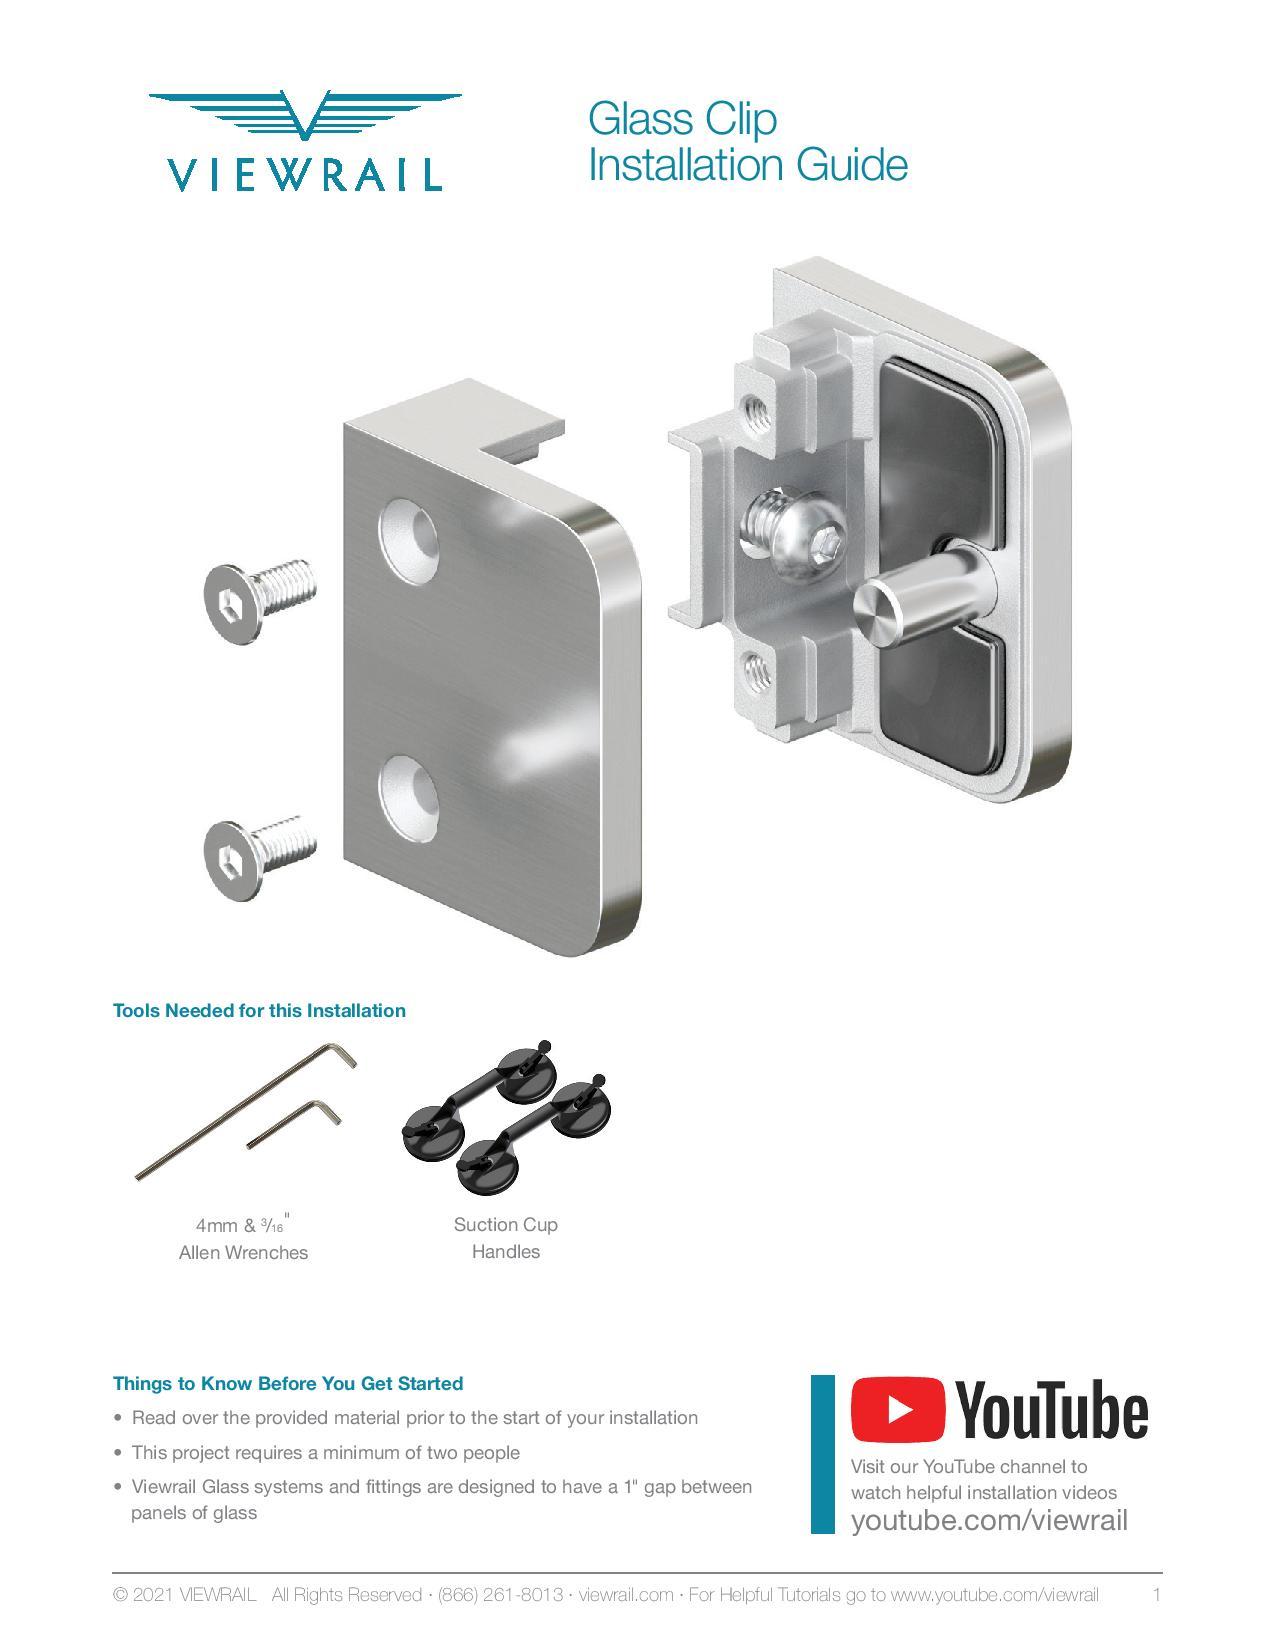 Glass Clip Installation Instructions